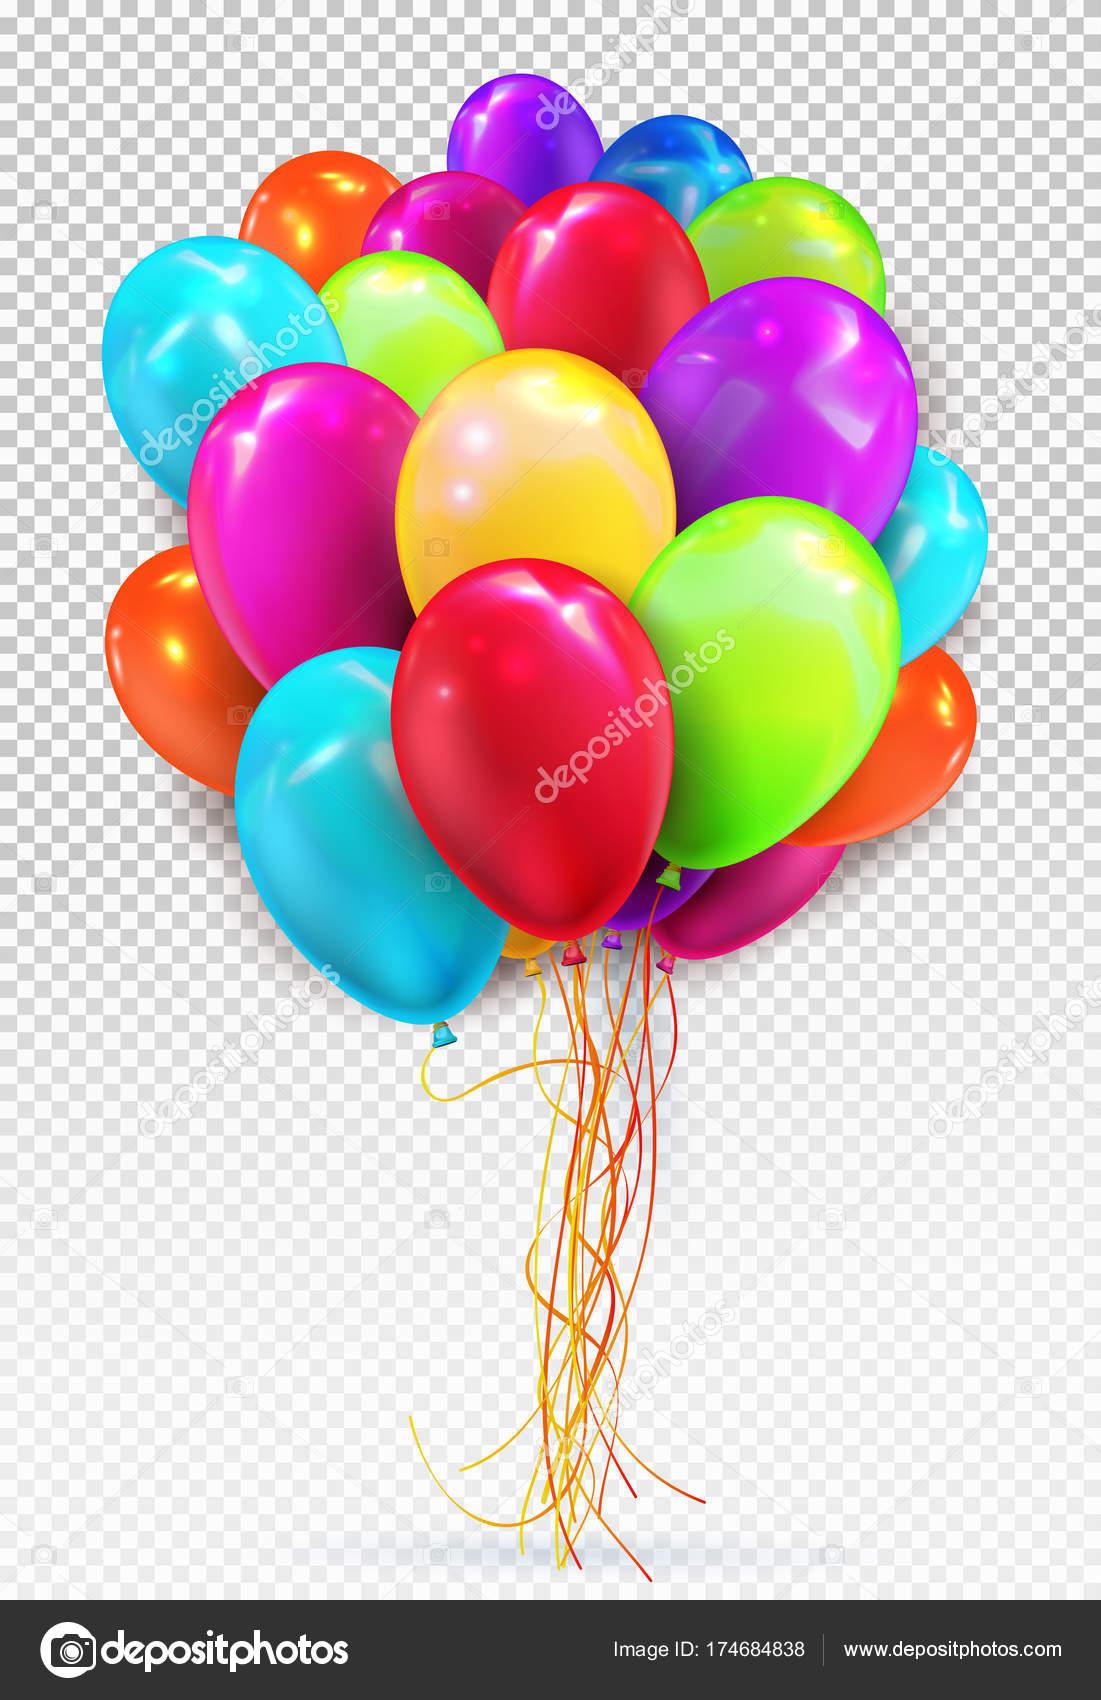 Heliumballon Festgelegten Farben Geburtstag Ballons Rot Gelb Grun